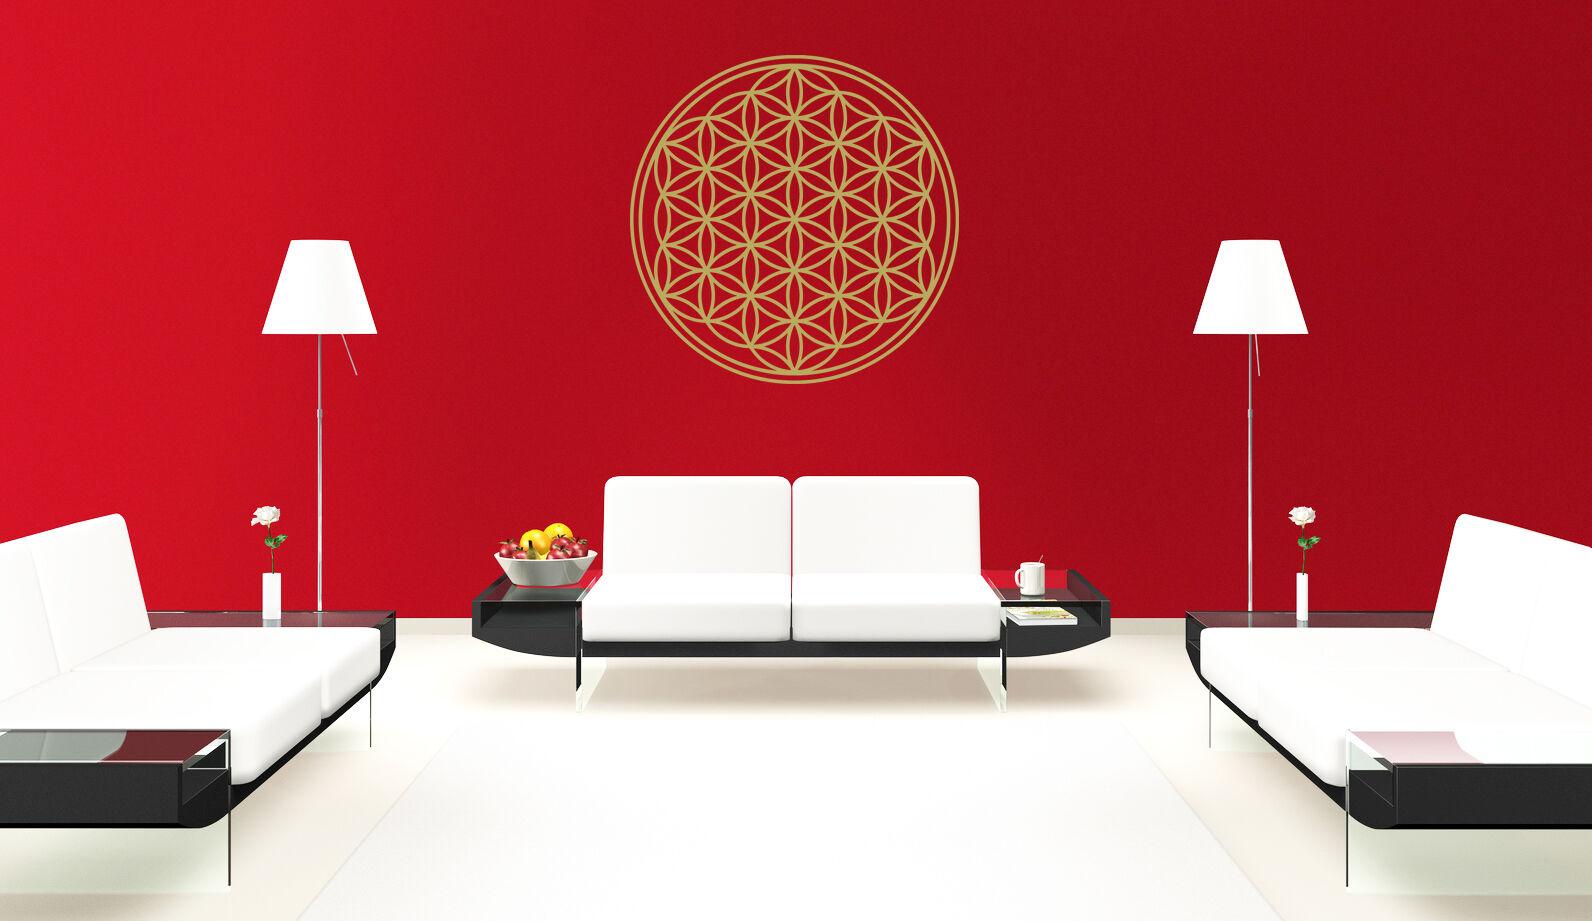 blume des lebens wandtattoo wandaufkleber spiritueller aufkleber flower of life eur 9 95. Black Bedroom Furniture Sets. Home Design Ideas